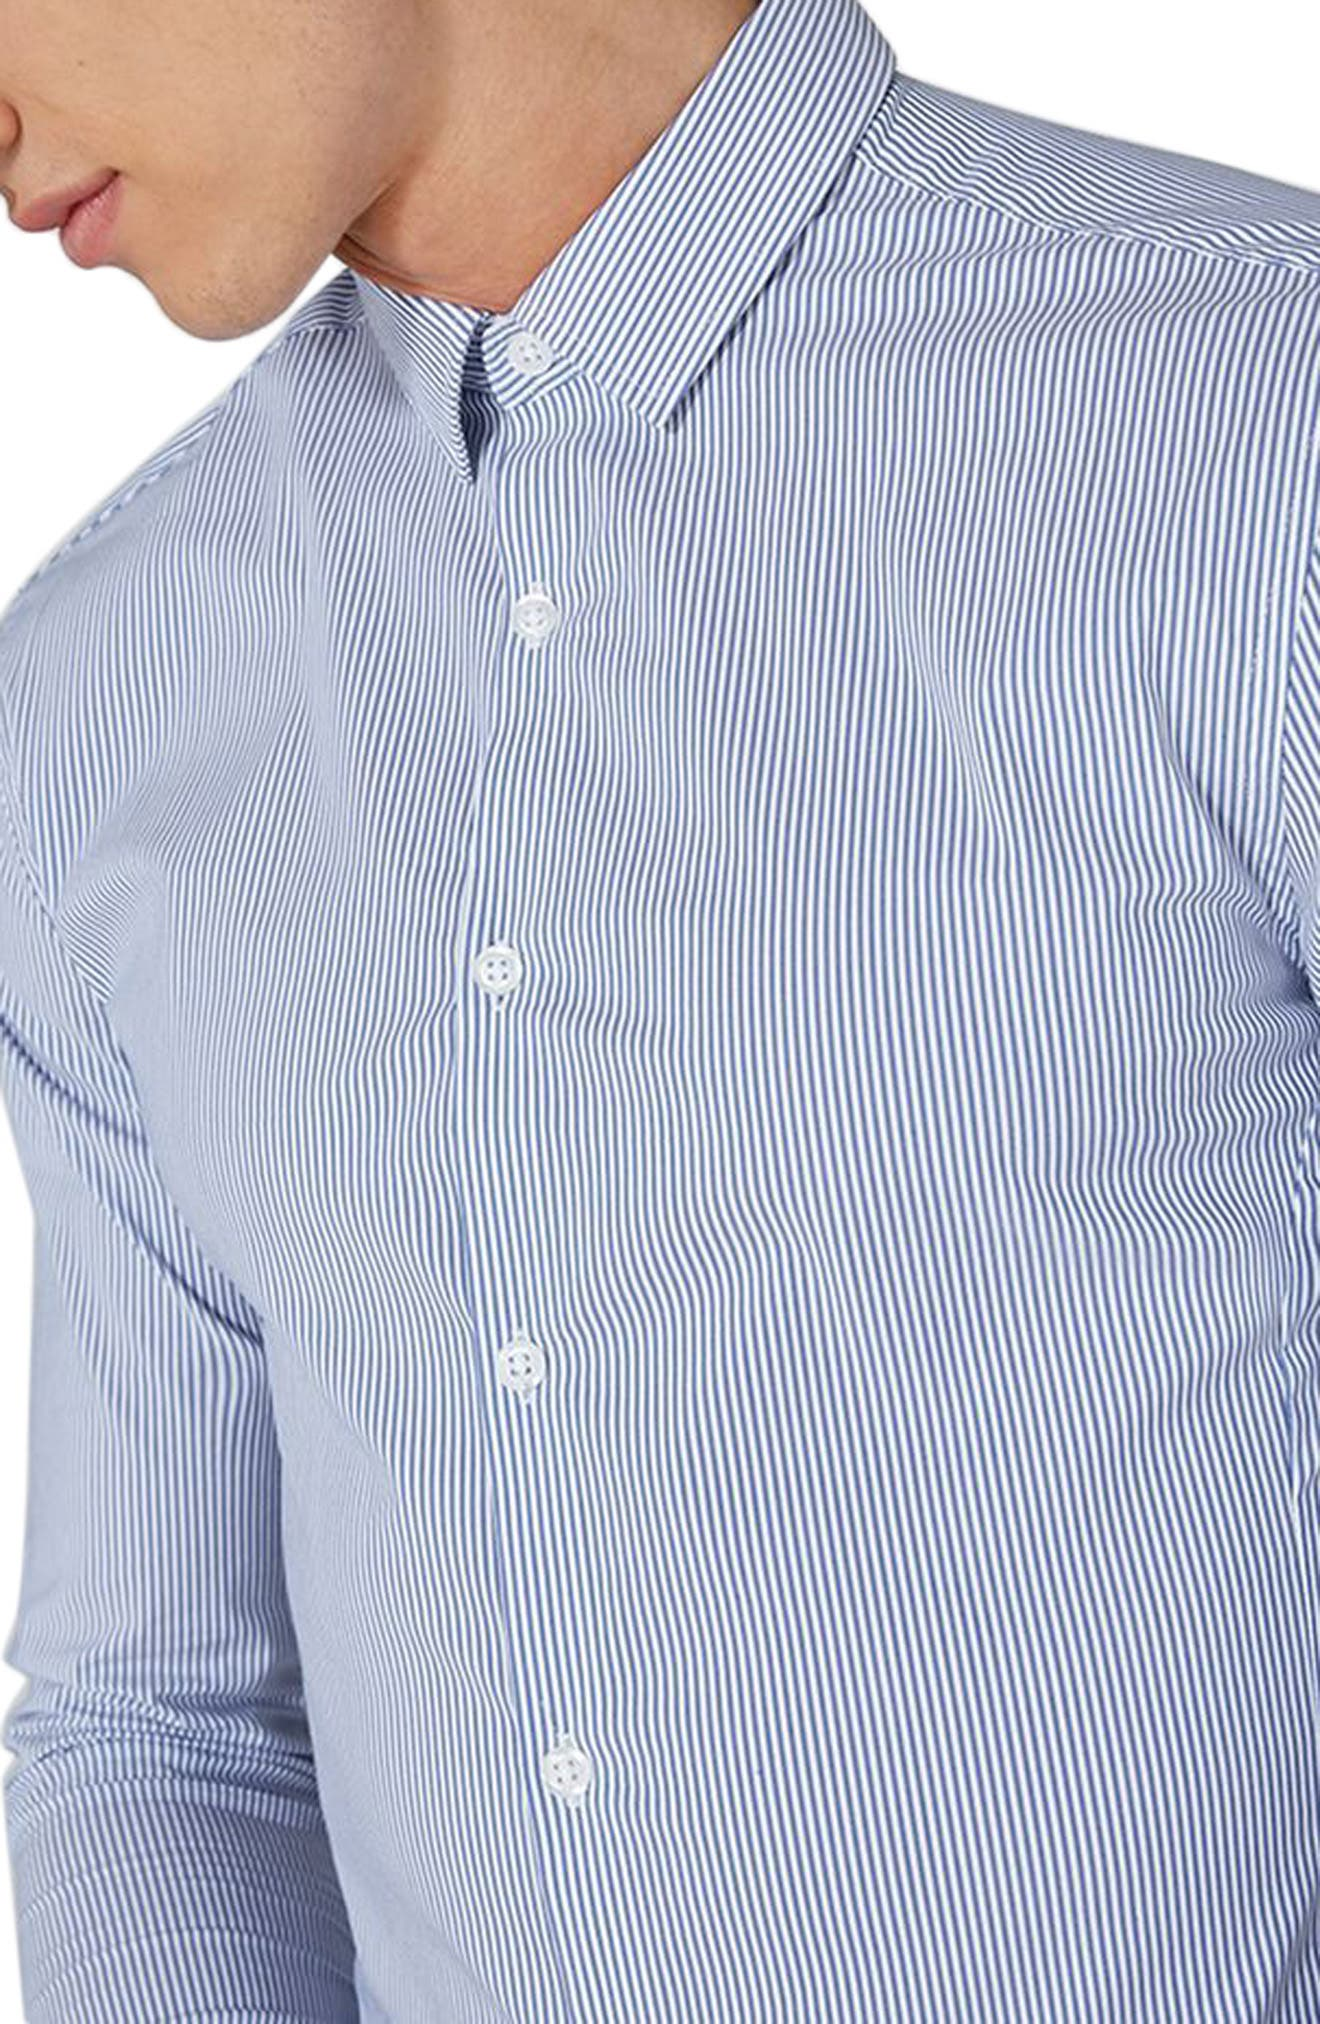 Muscle Fit Smart Shirt,                             Alternate thumbnail 2, color,                             Blue Multi